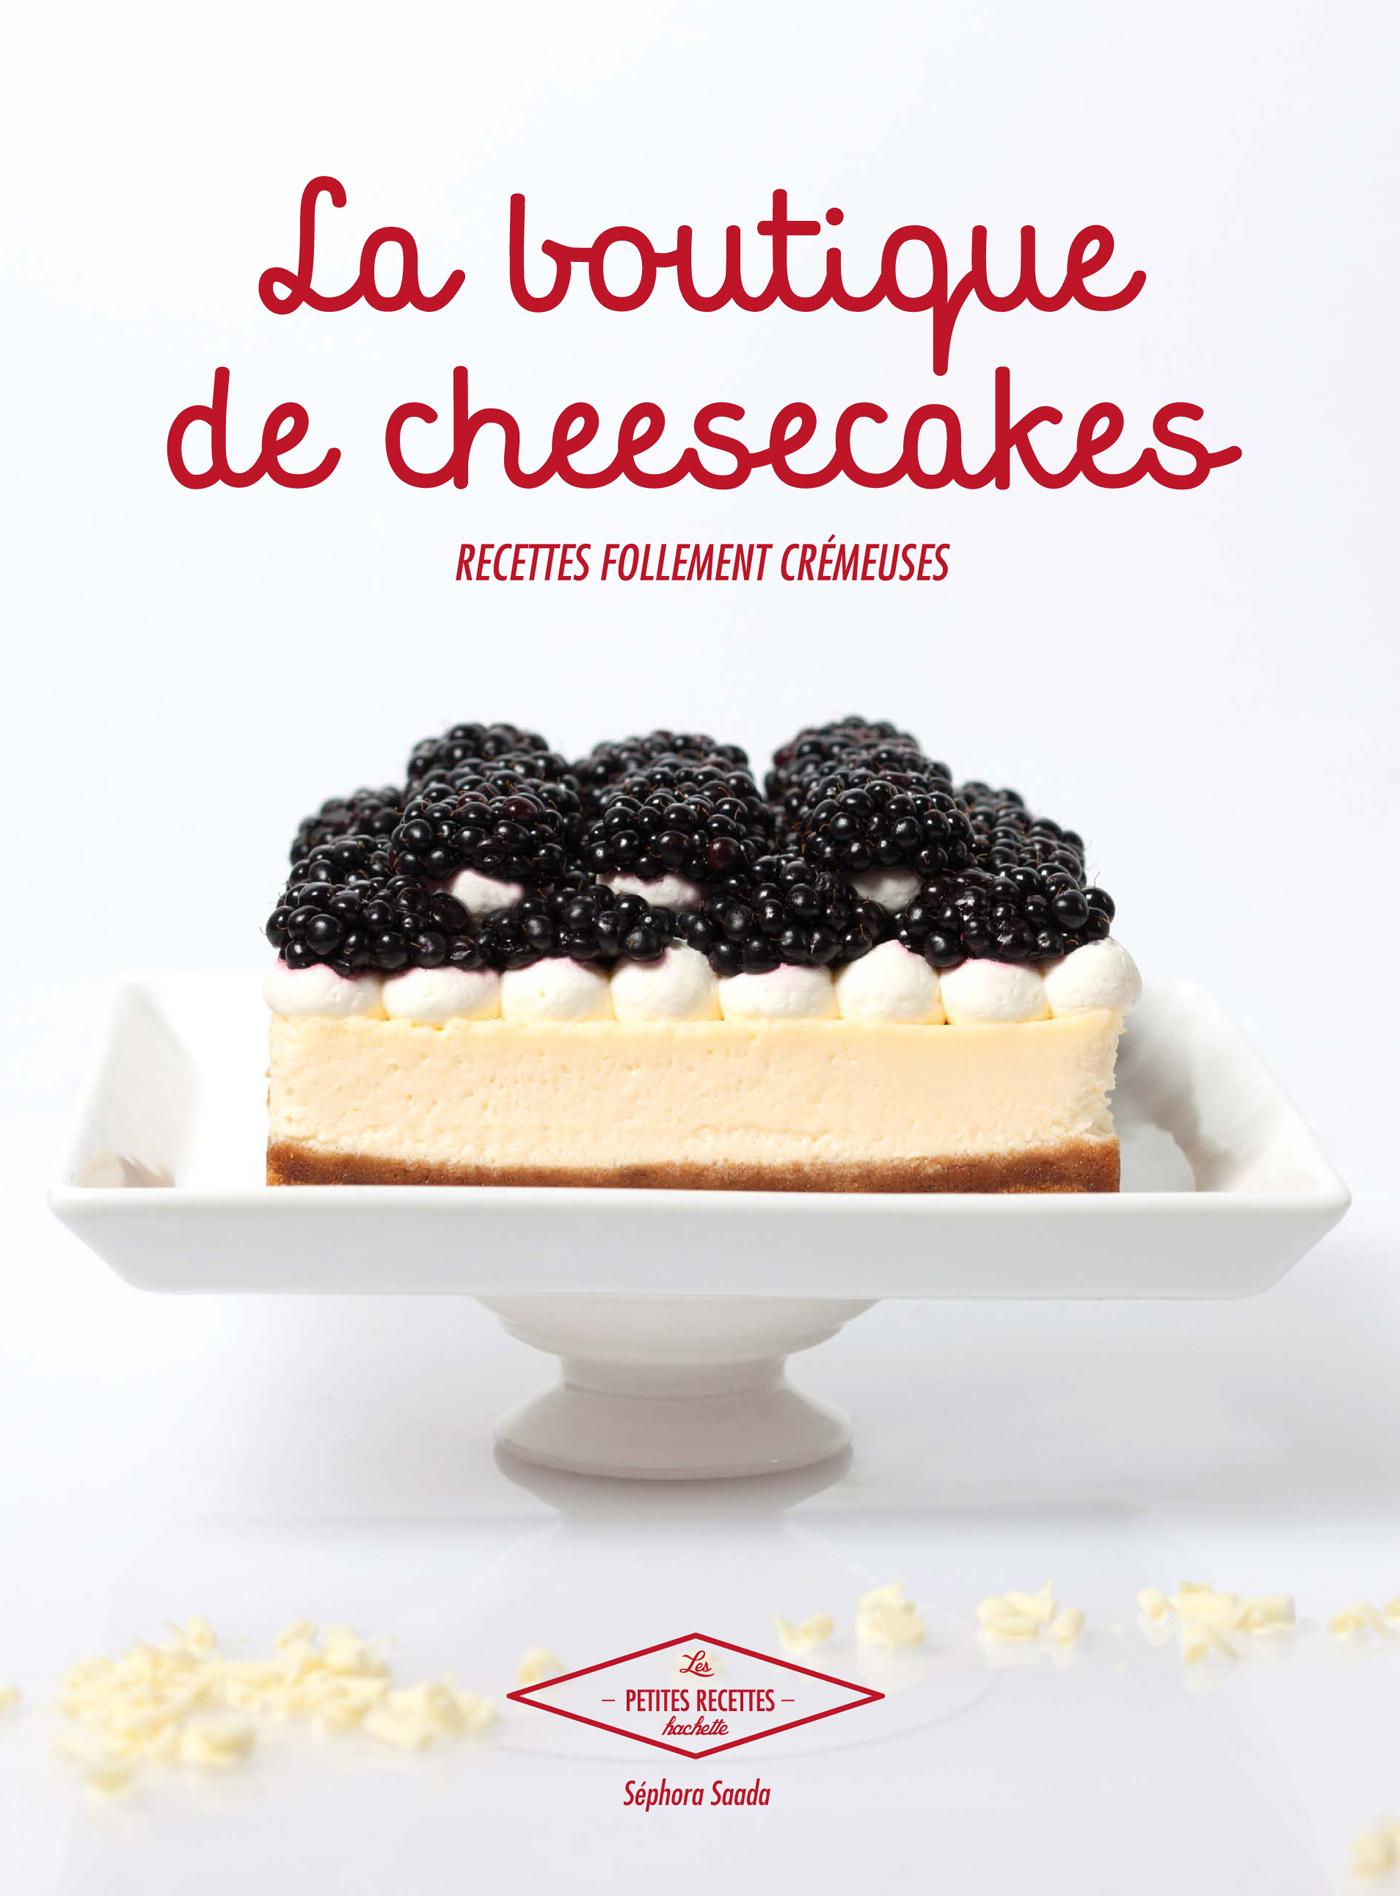 livre : la boutique de cheesecakes de sephora saada - untitled